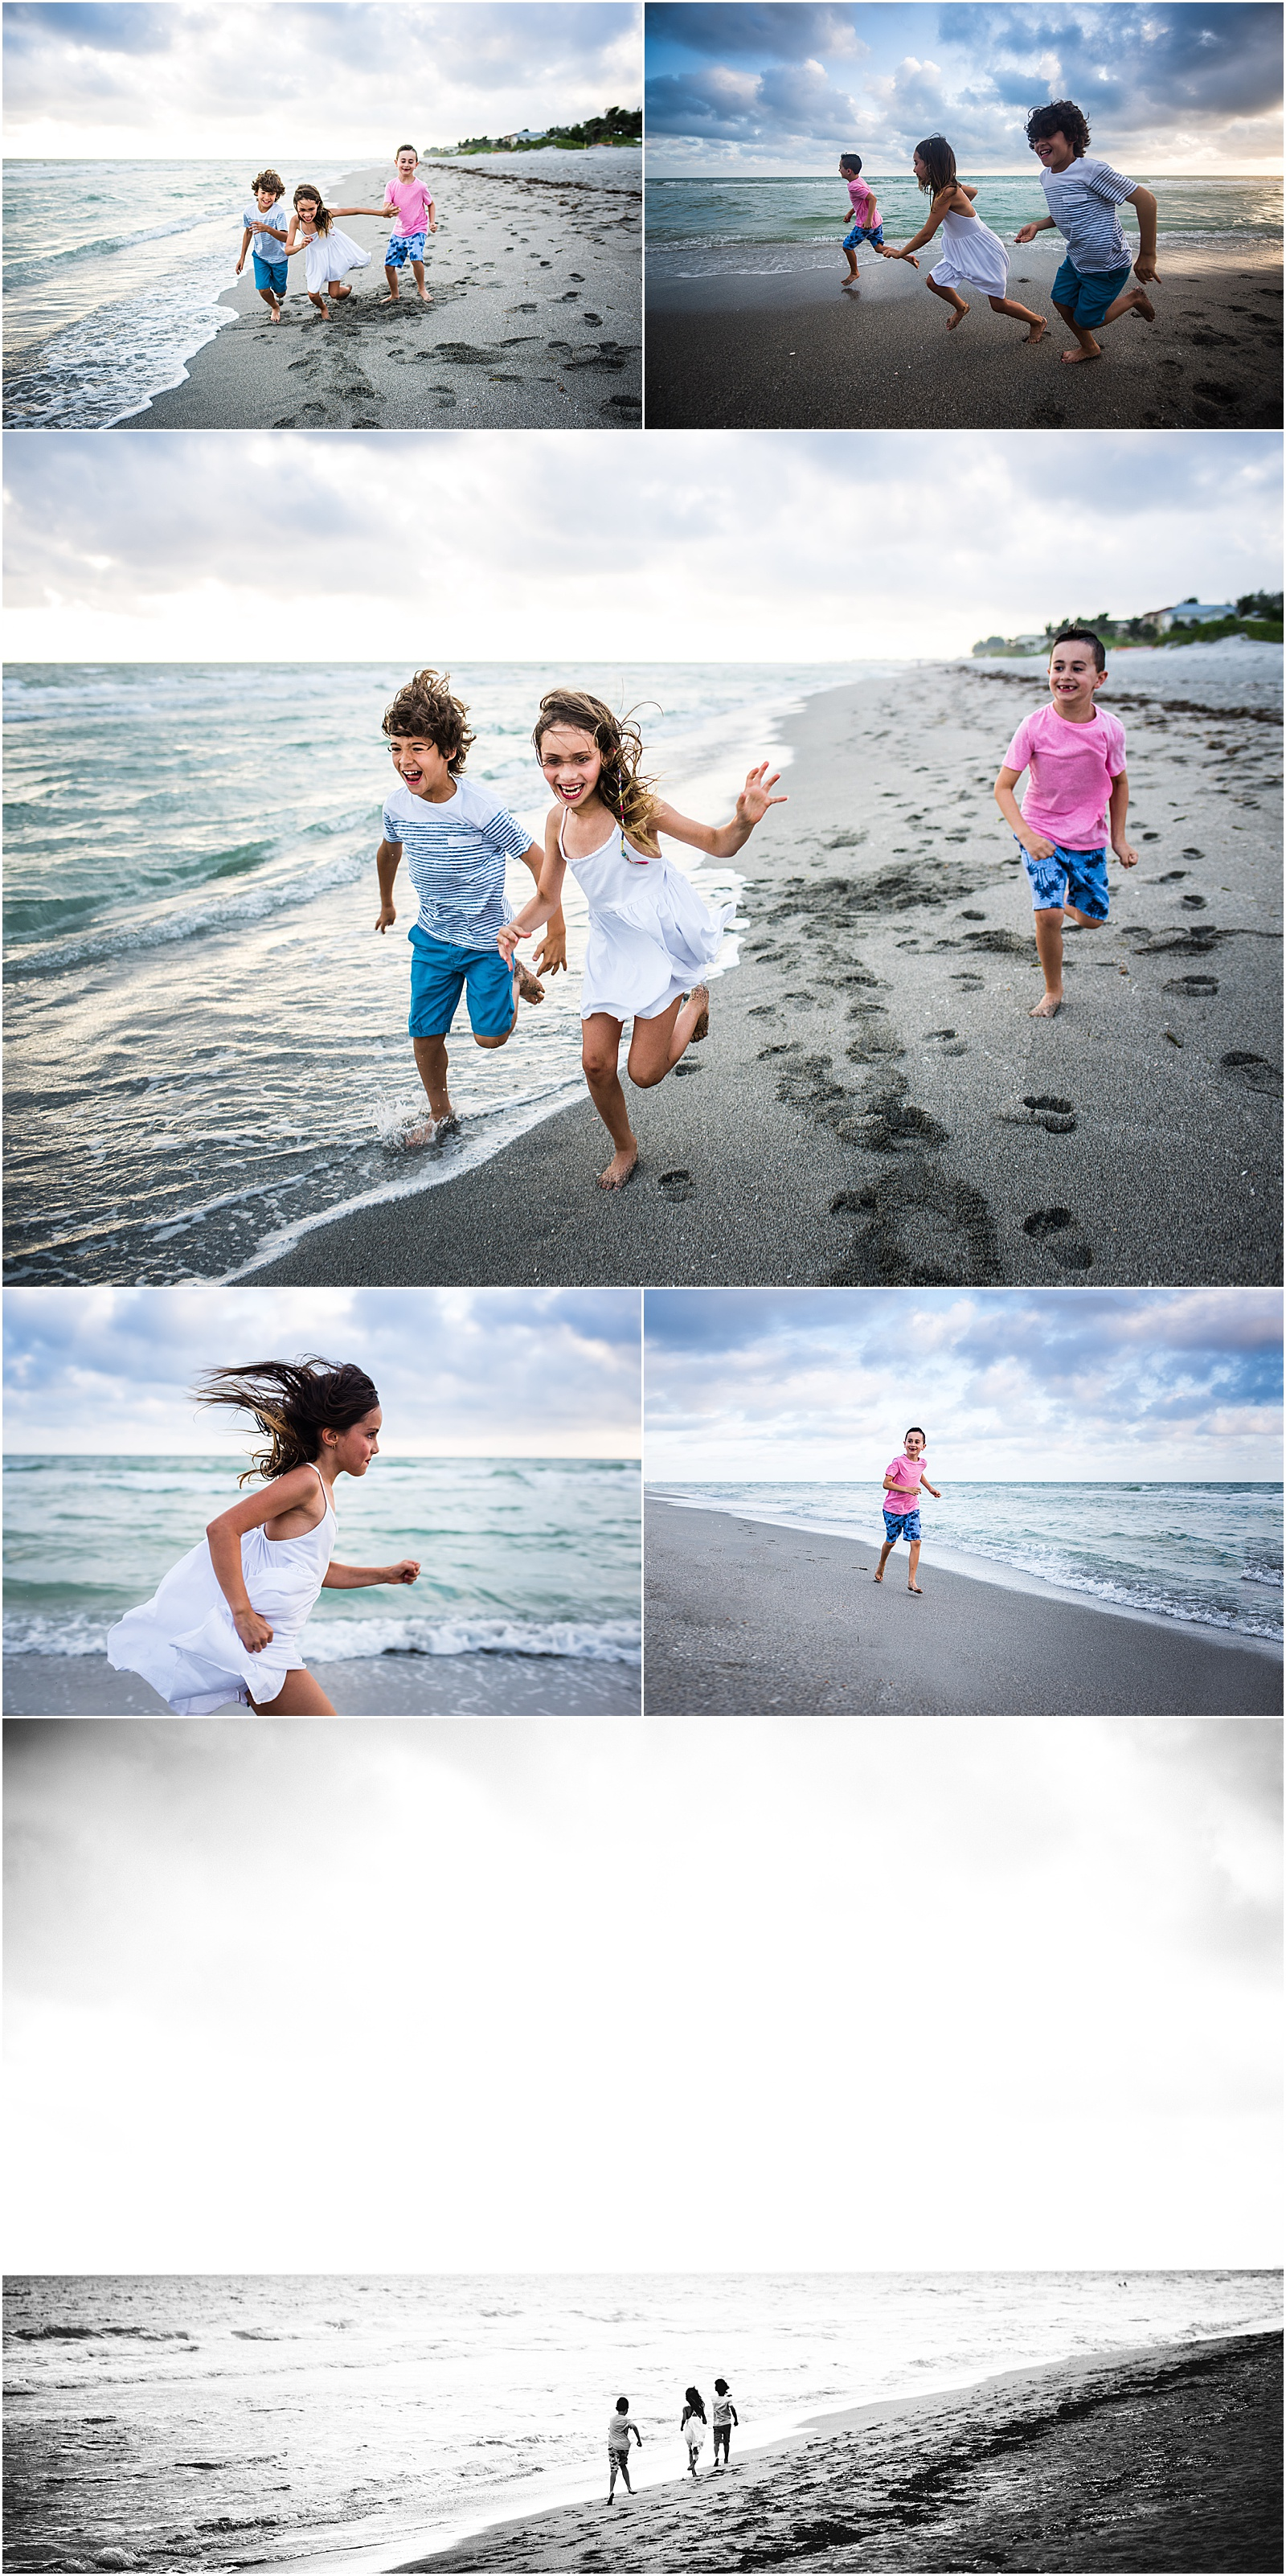 Beach_Friends6.jpg